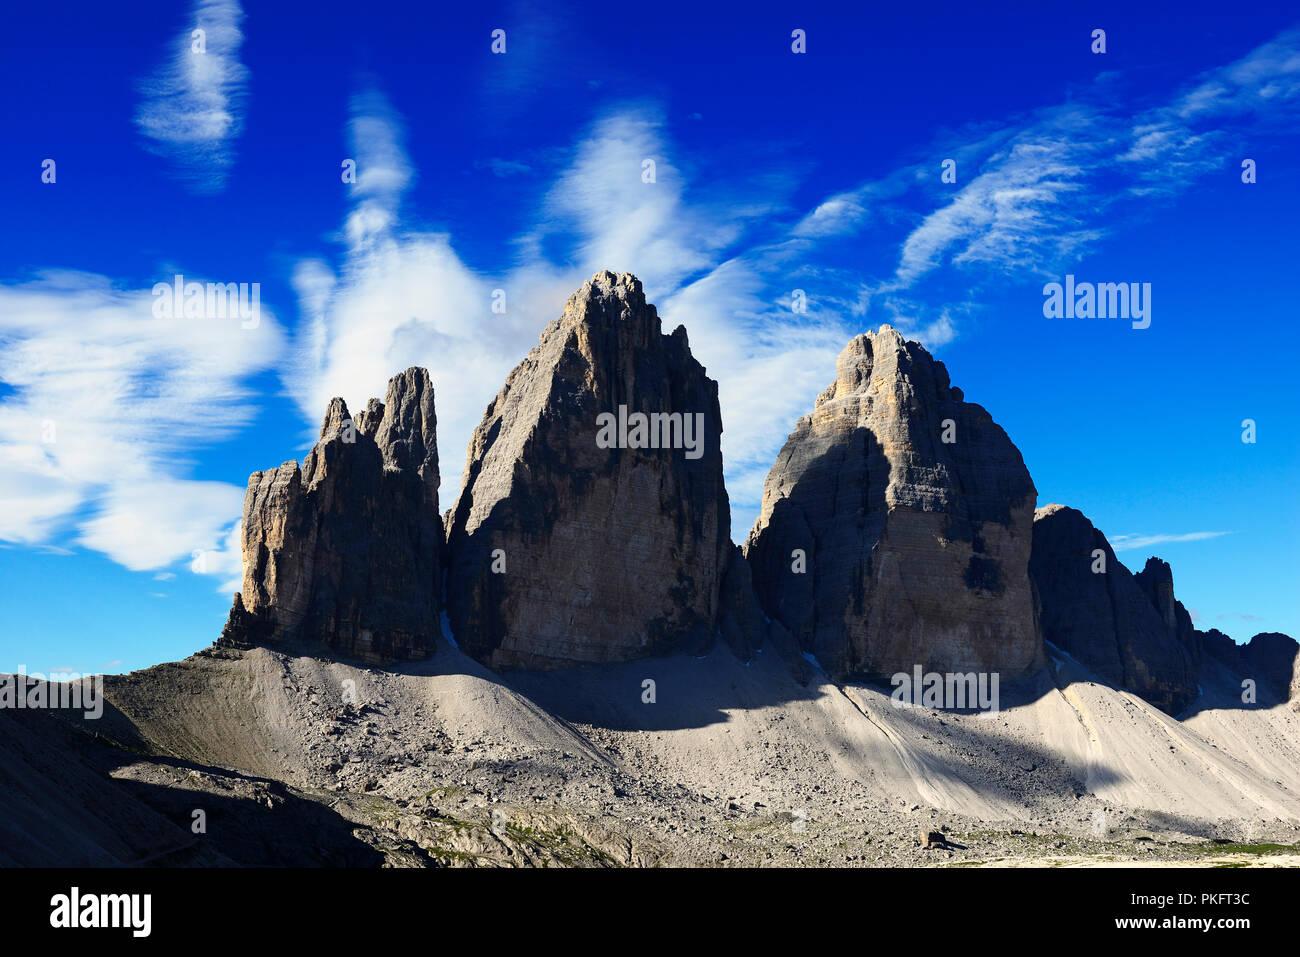 North walls of the Three Peaks of Lavaredo, Sesto Dolomites, Alta Pusteria, South Tyrol, Italy Stock Photo